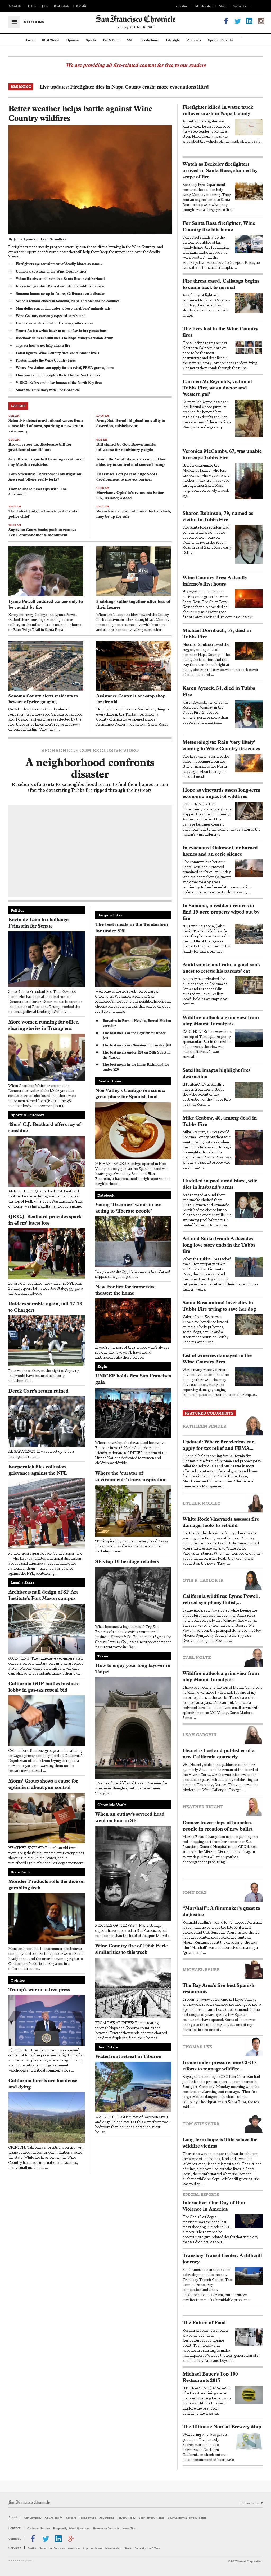 San Francisco Chronicle at Monday Oct. 16, 2017, 5:13 p.m. UTC